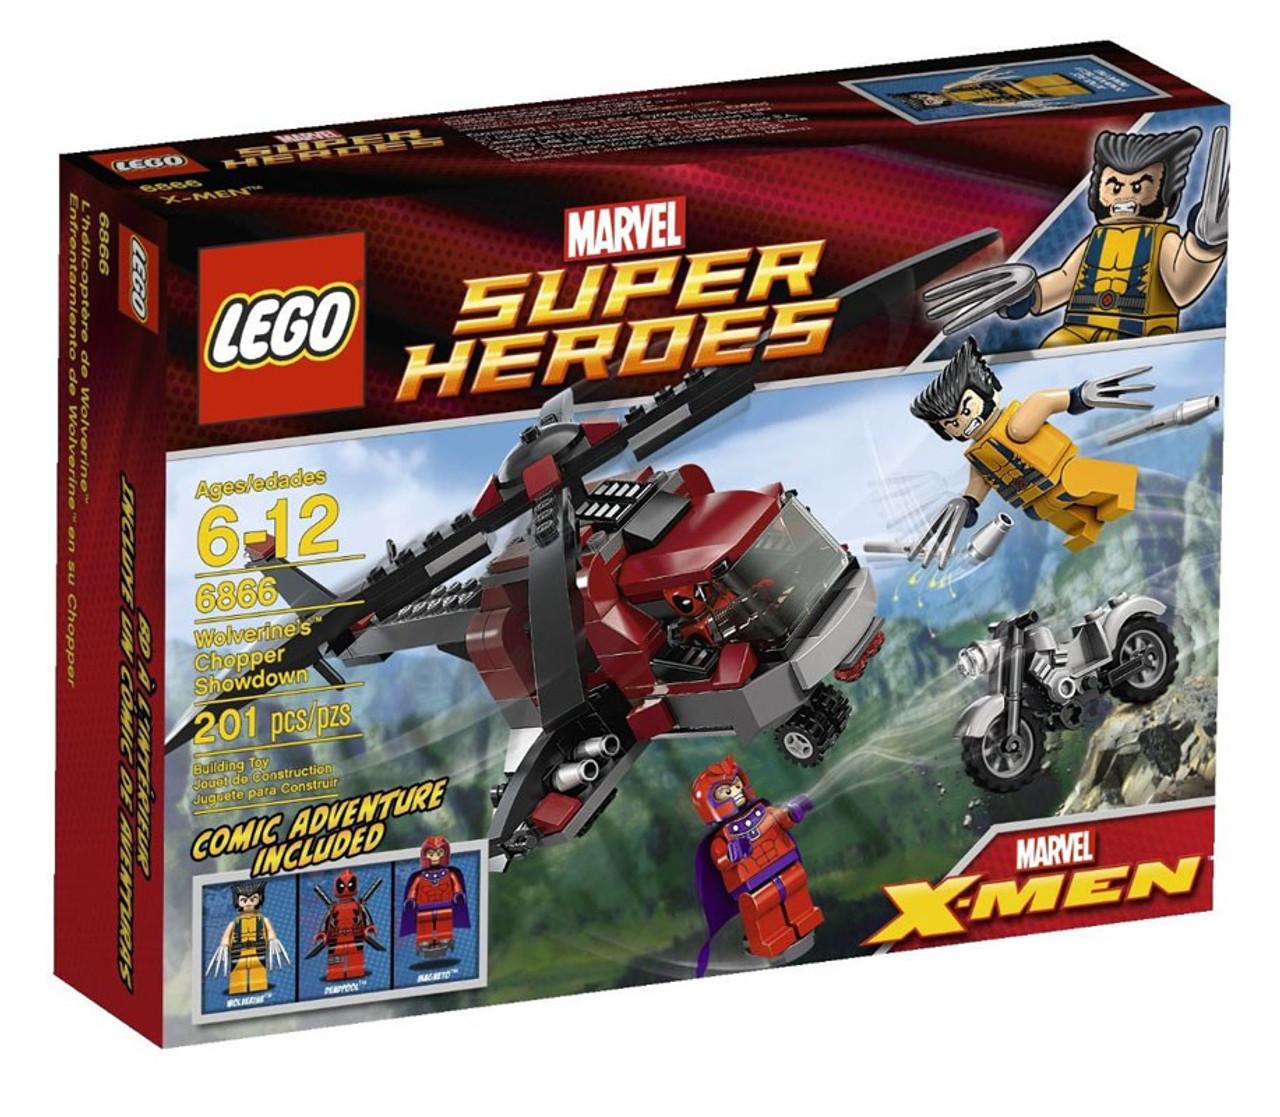 LEGO Marvel Super Heroes X-Men Wolverines Chopper Showdown ...